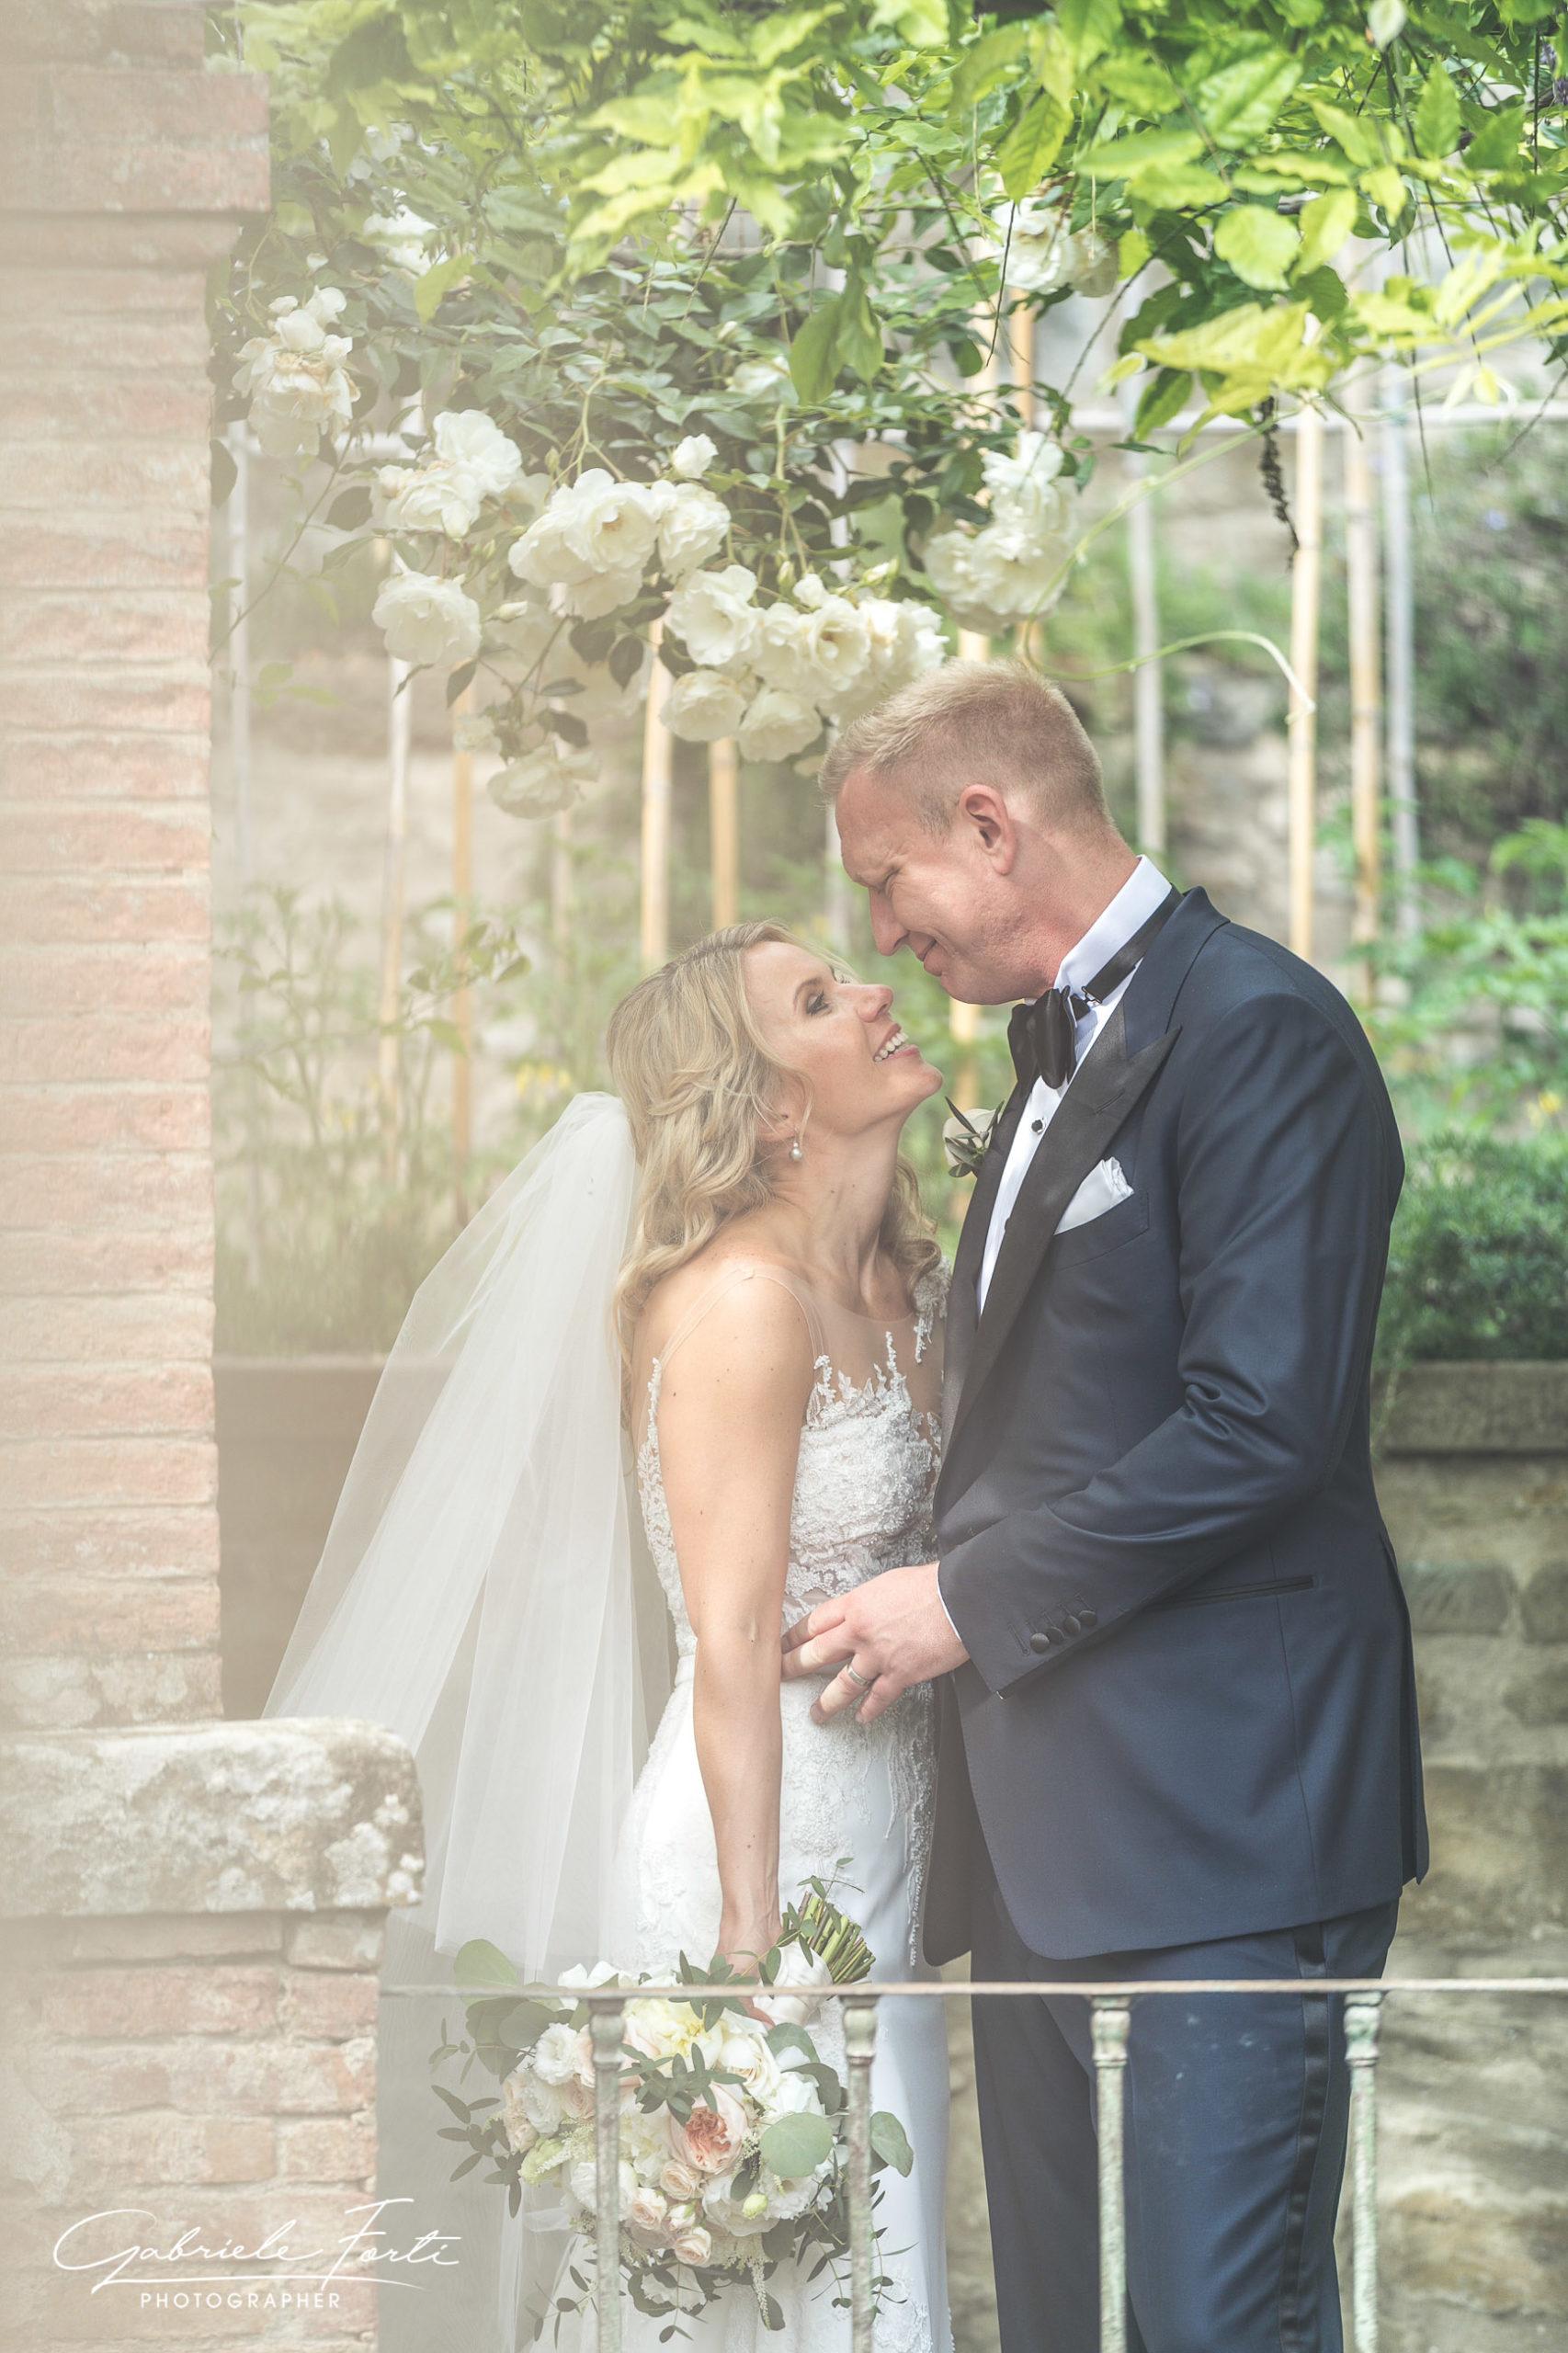 wedding-cortona-tuscany-italy-photographer-foto-forti-gabriele-villa-laura-1